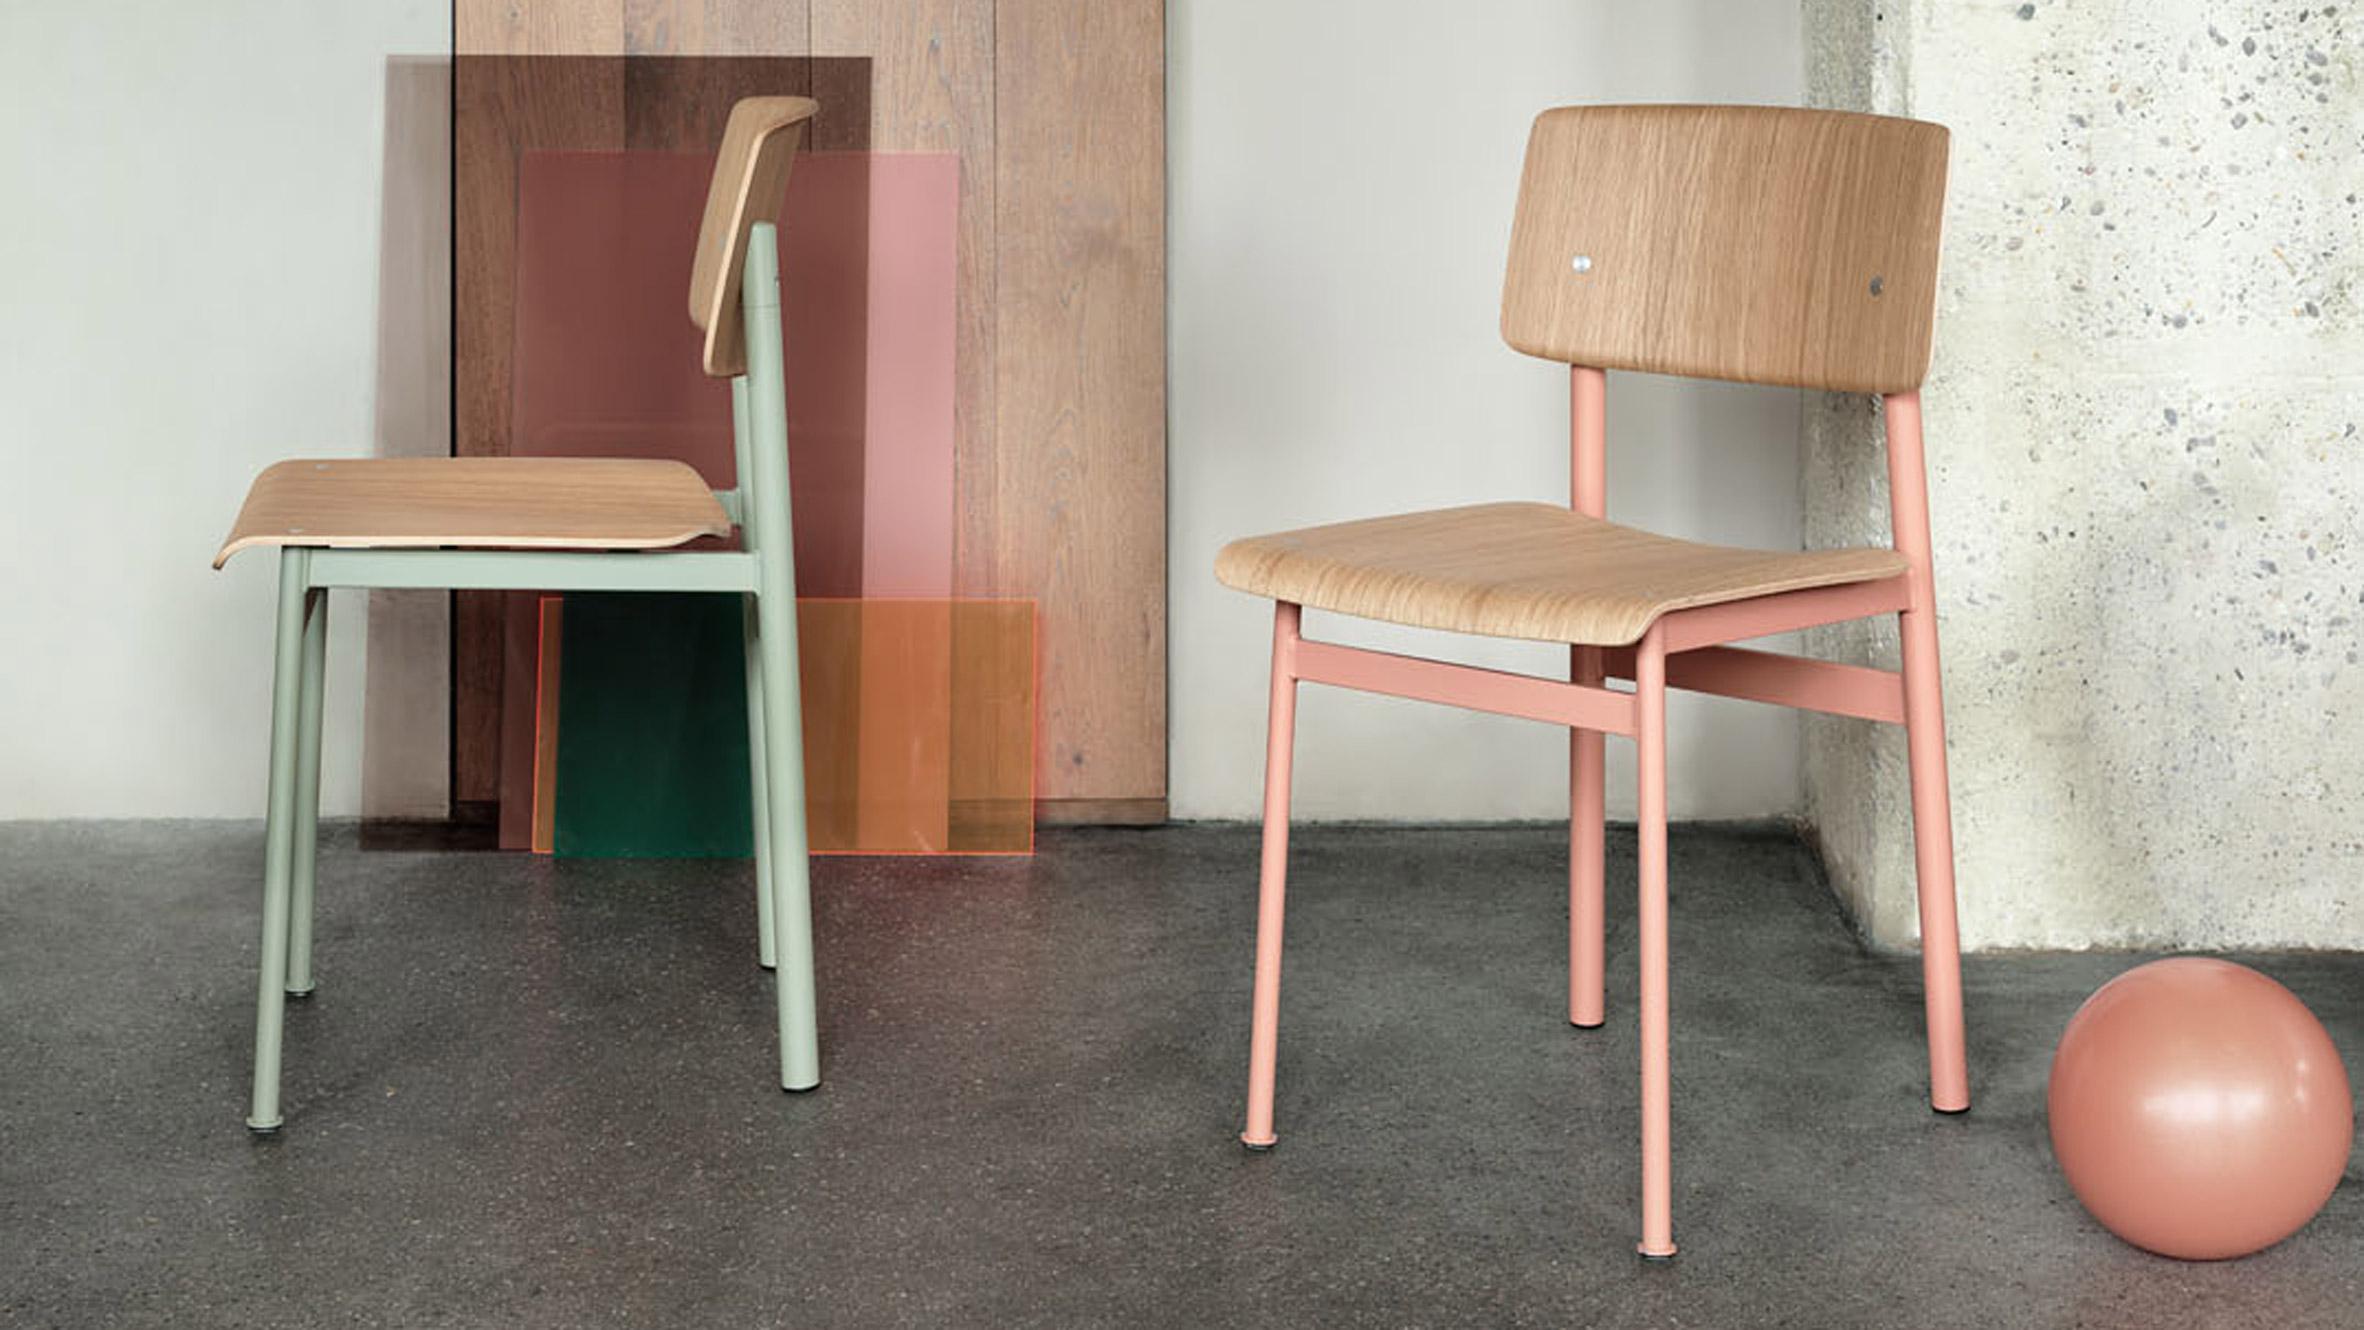 Knoll purchases Scandinavian brand Muuto in